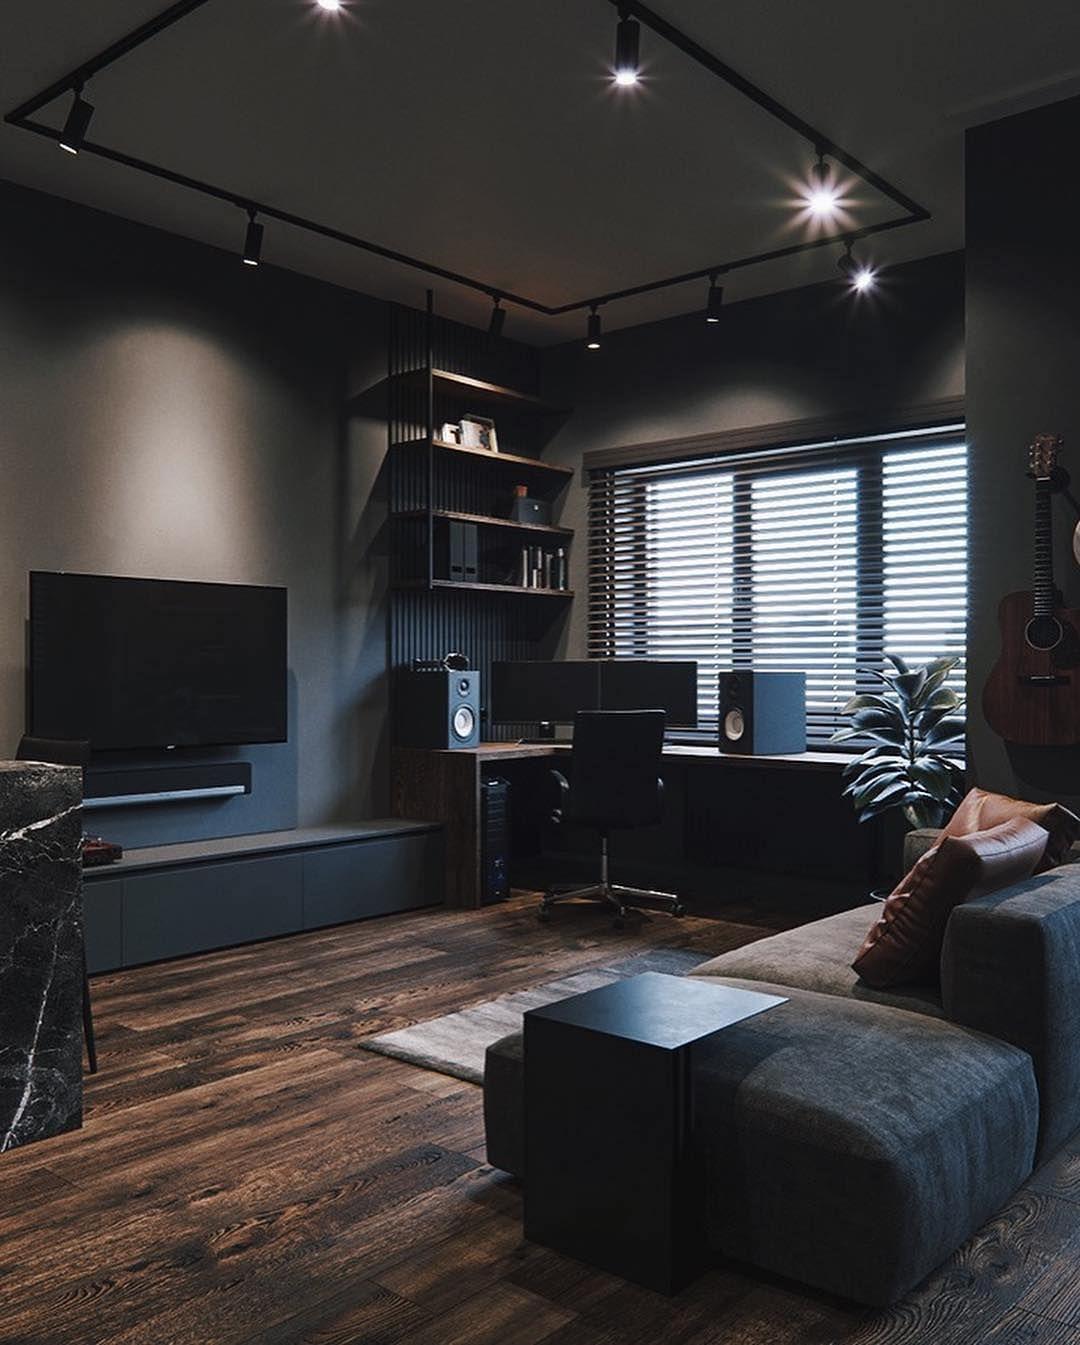 "ISetups On Instagram: ""Blacked-Out Bedroom 💣 📸: @skar"